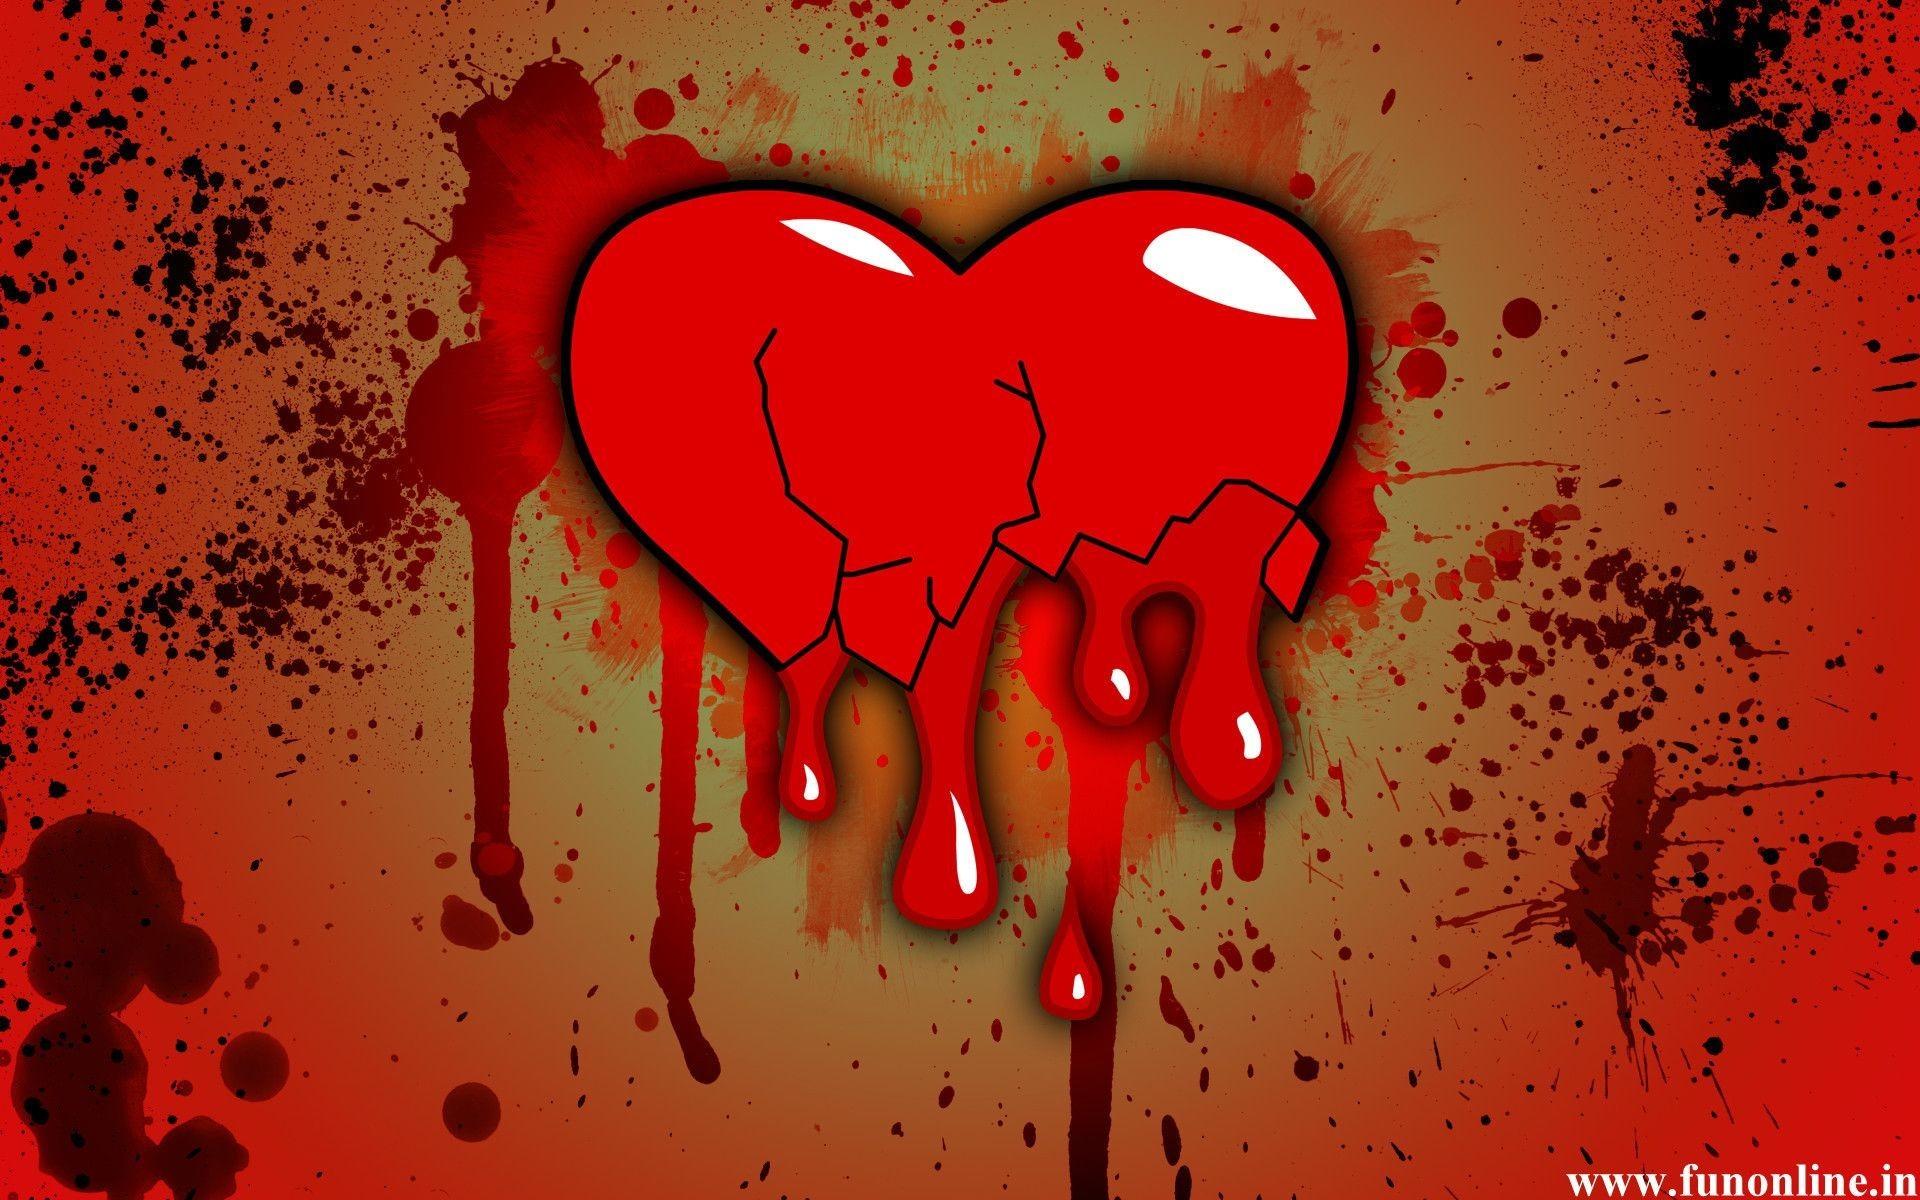 Res: 1920x1200, 1920x1080 Love-heart-wallpaper-hd-download